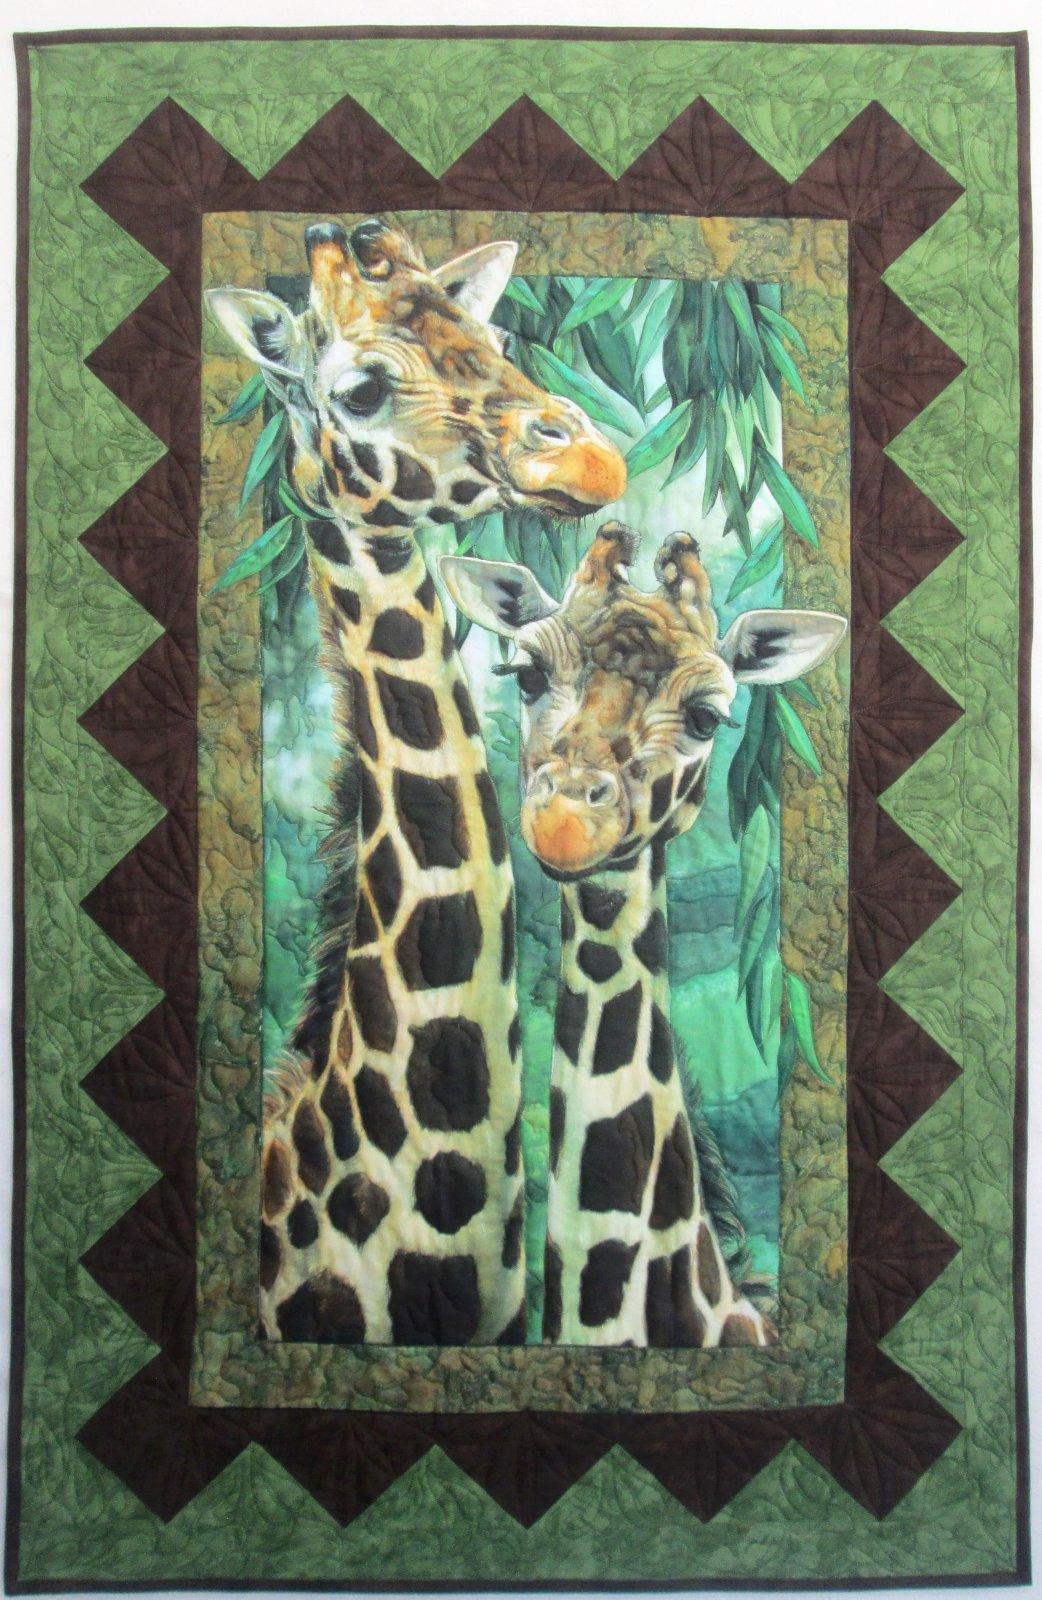 Artworks Giraffe Go Bananas Quilt or Wall Hanging Sample 33 x 51